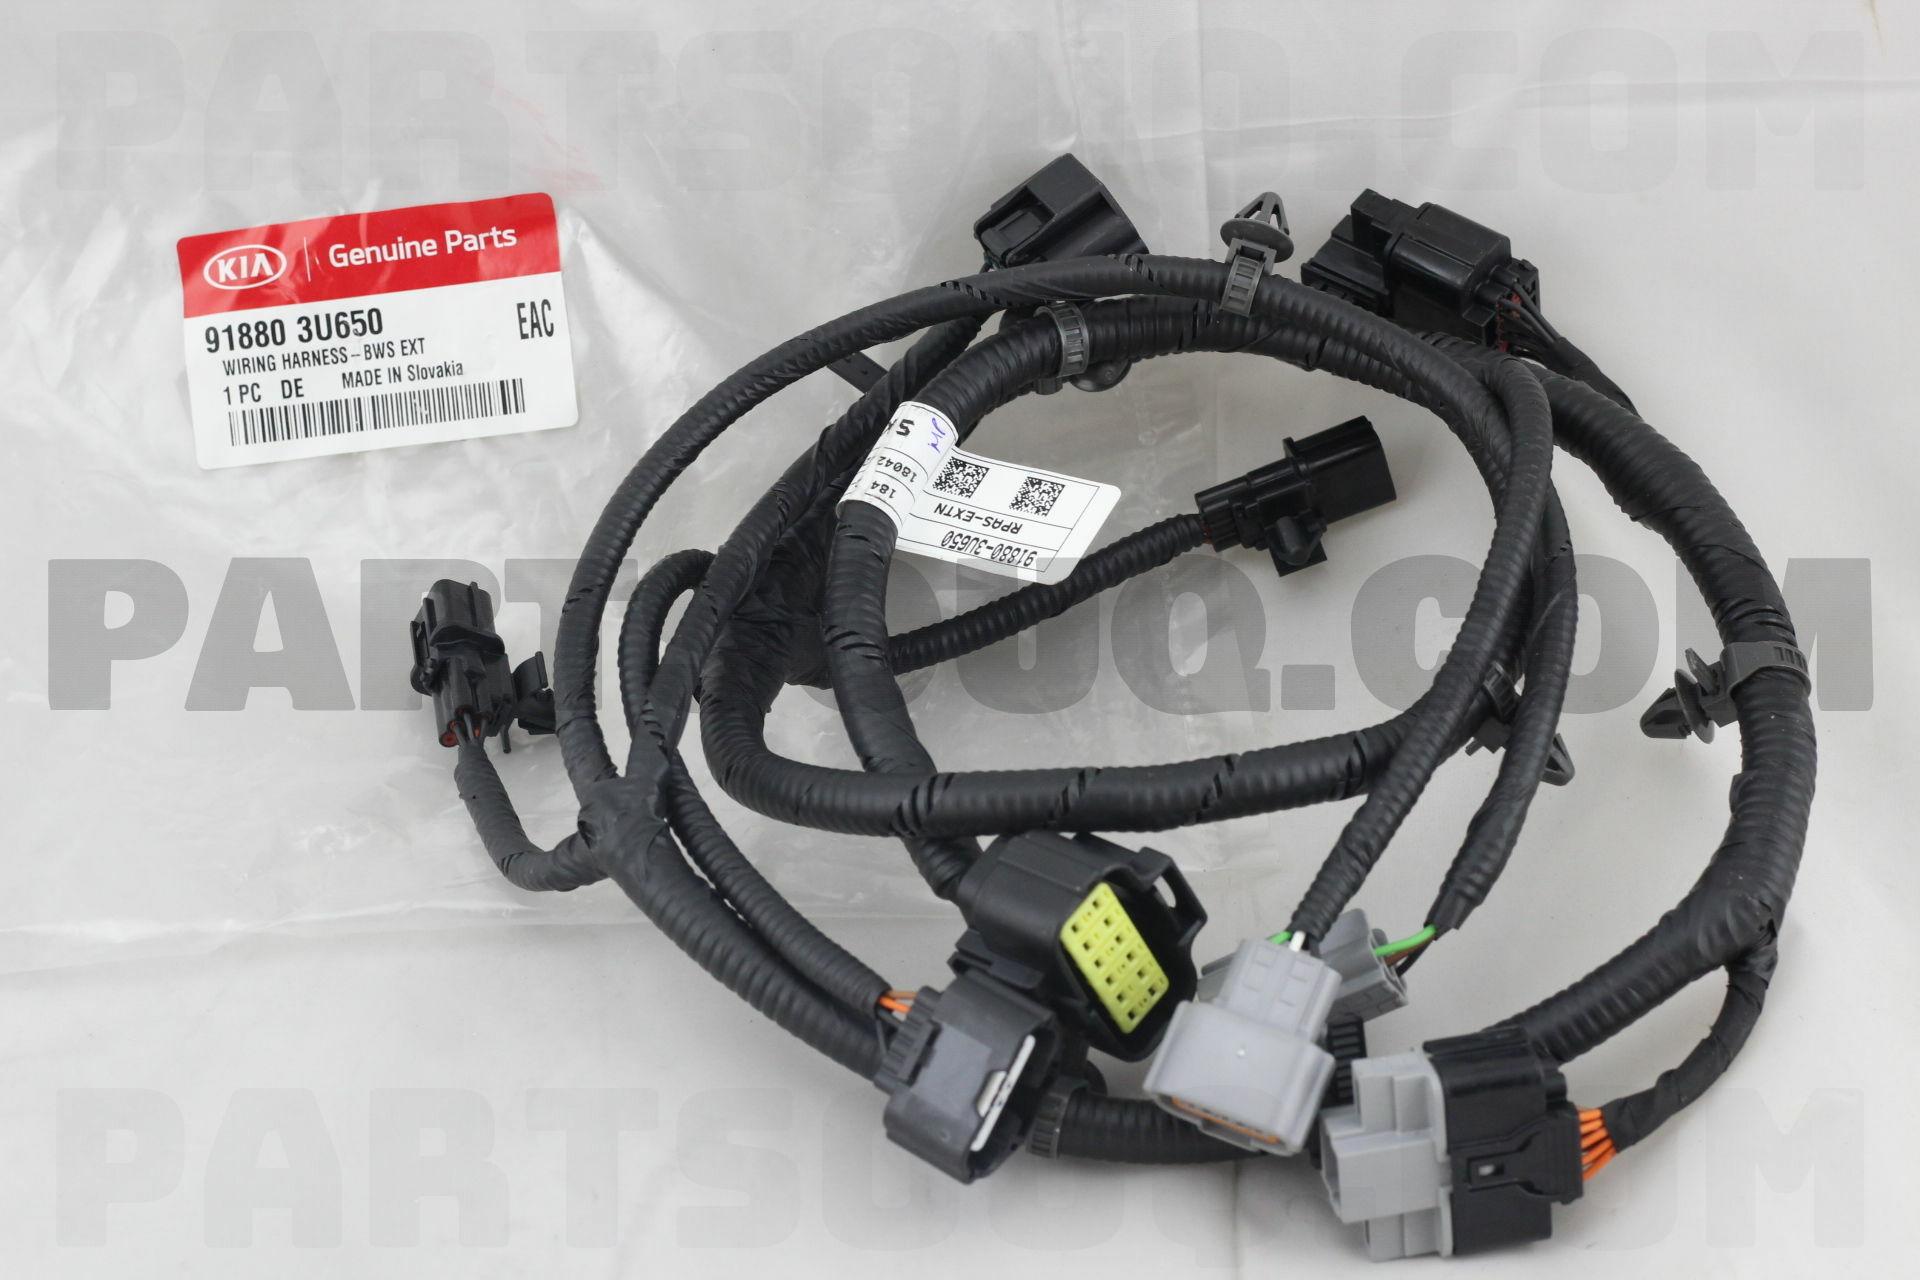 ... Kia Wiring Harness Parts - Electrical wiring diagrams on chevrolet  speed sensor, chevrolet ecu, Chevrolet Venture ...